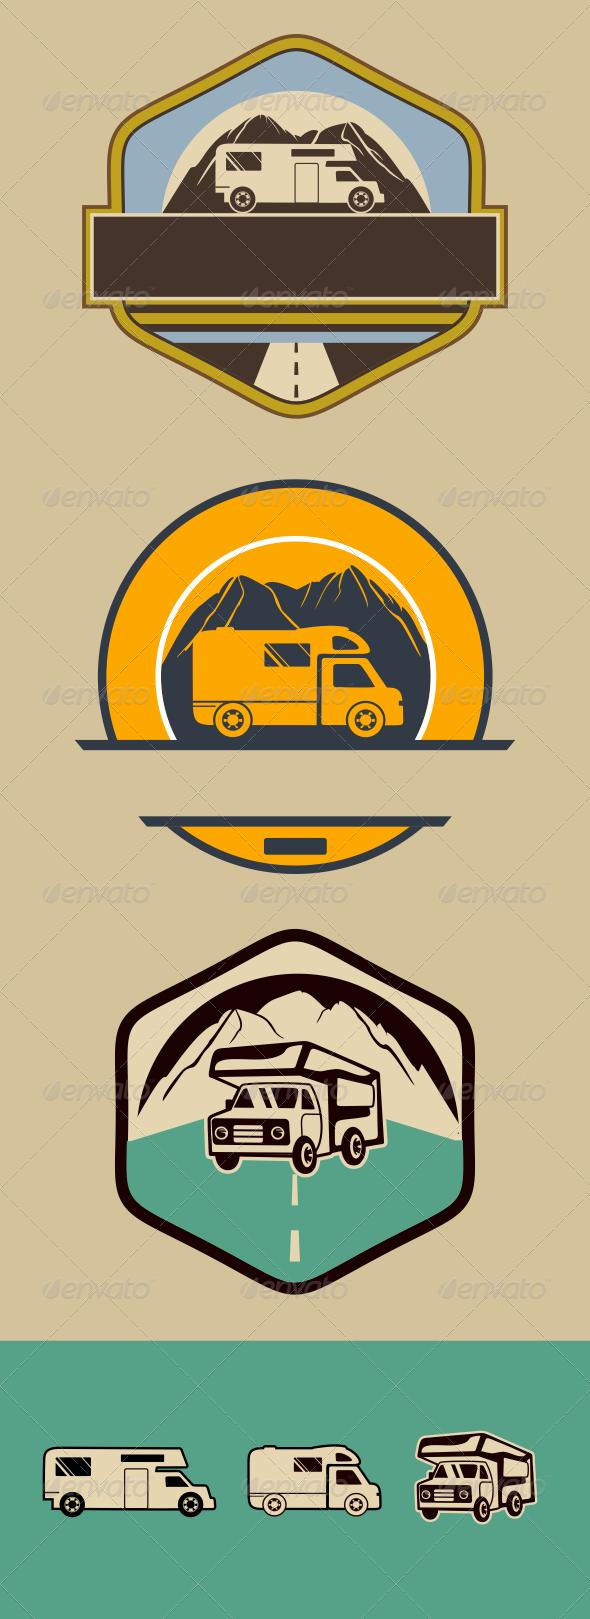 GraphicRiver Three Vintage RV Camper Badges 6520846